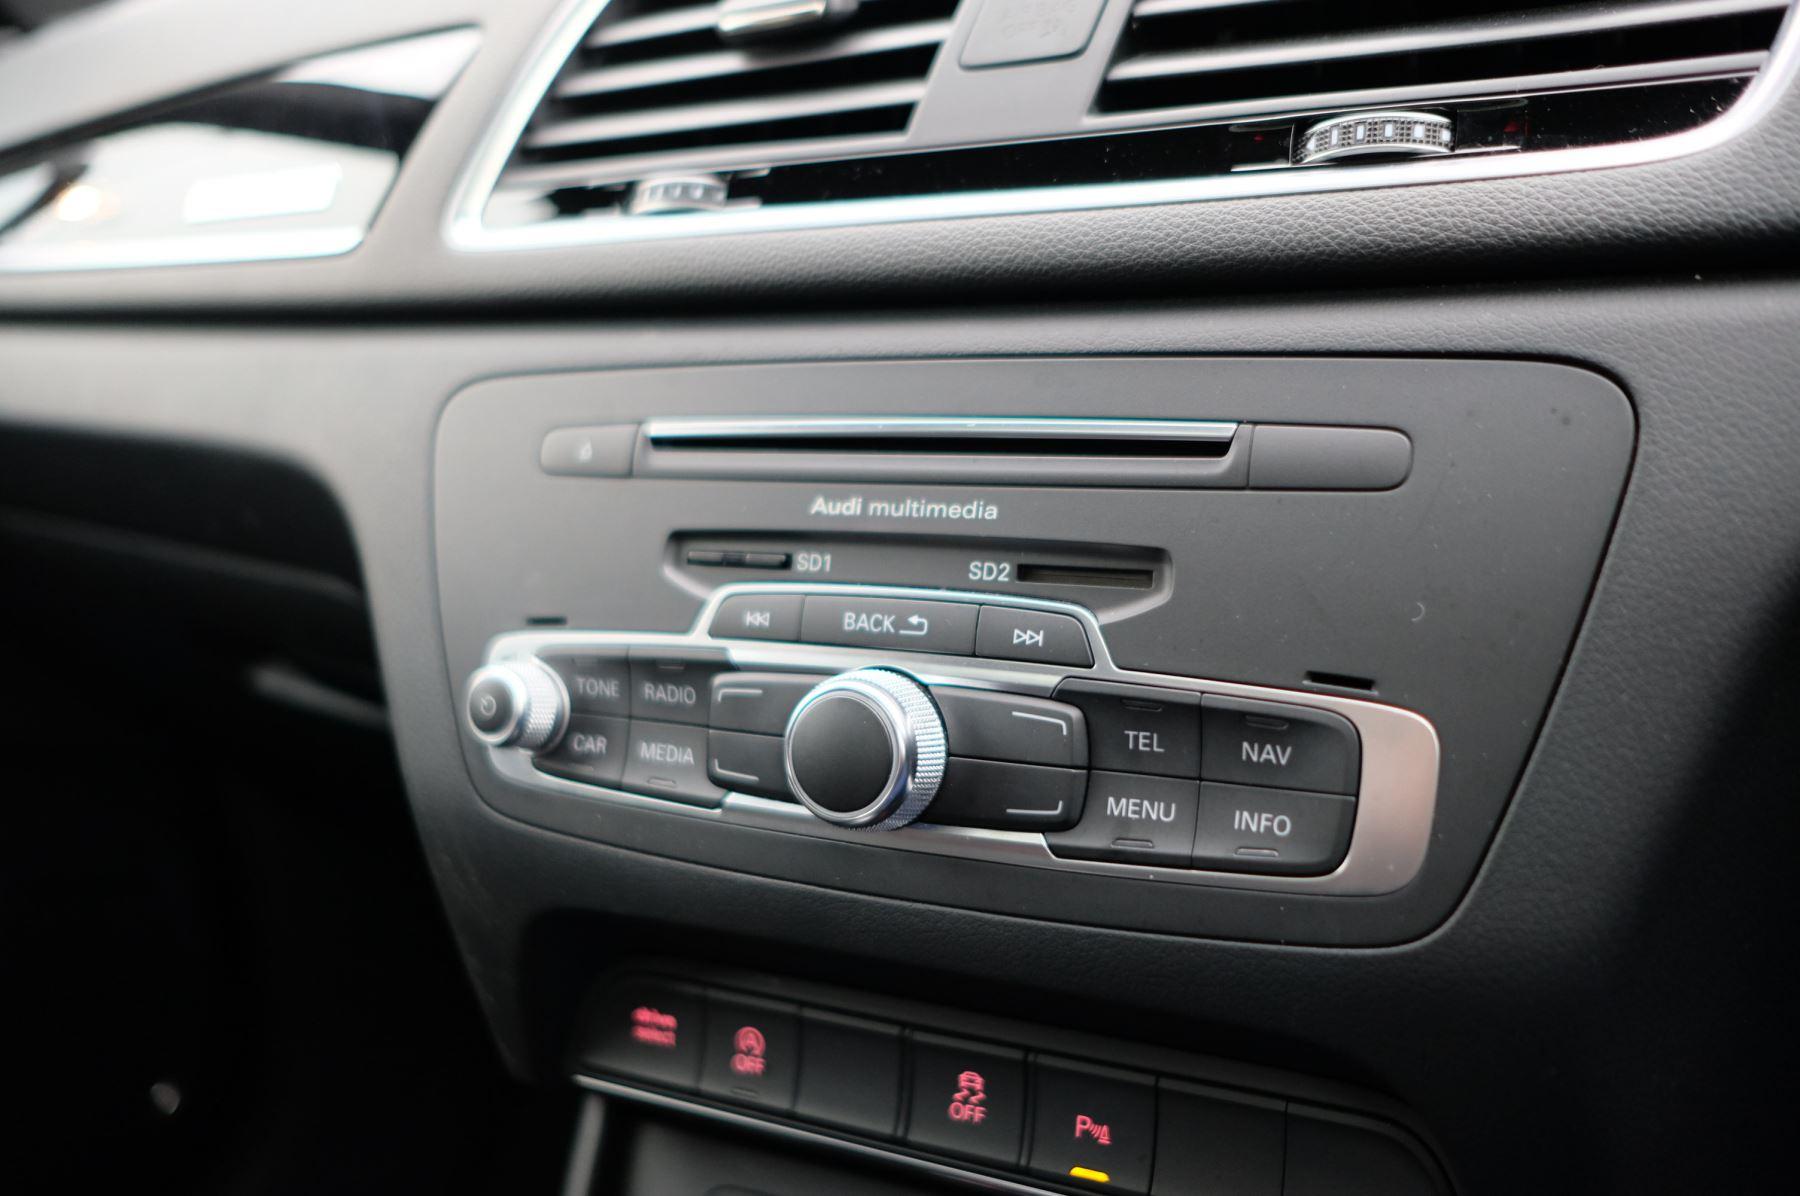 Audi Q3 2.0T FSI Quattro Black Edition 5dr S Tronic - Panoramic glass sunroof image 30